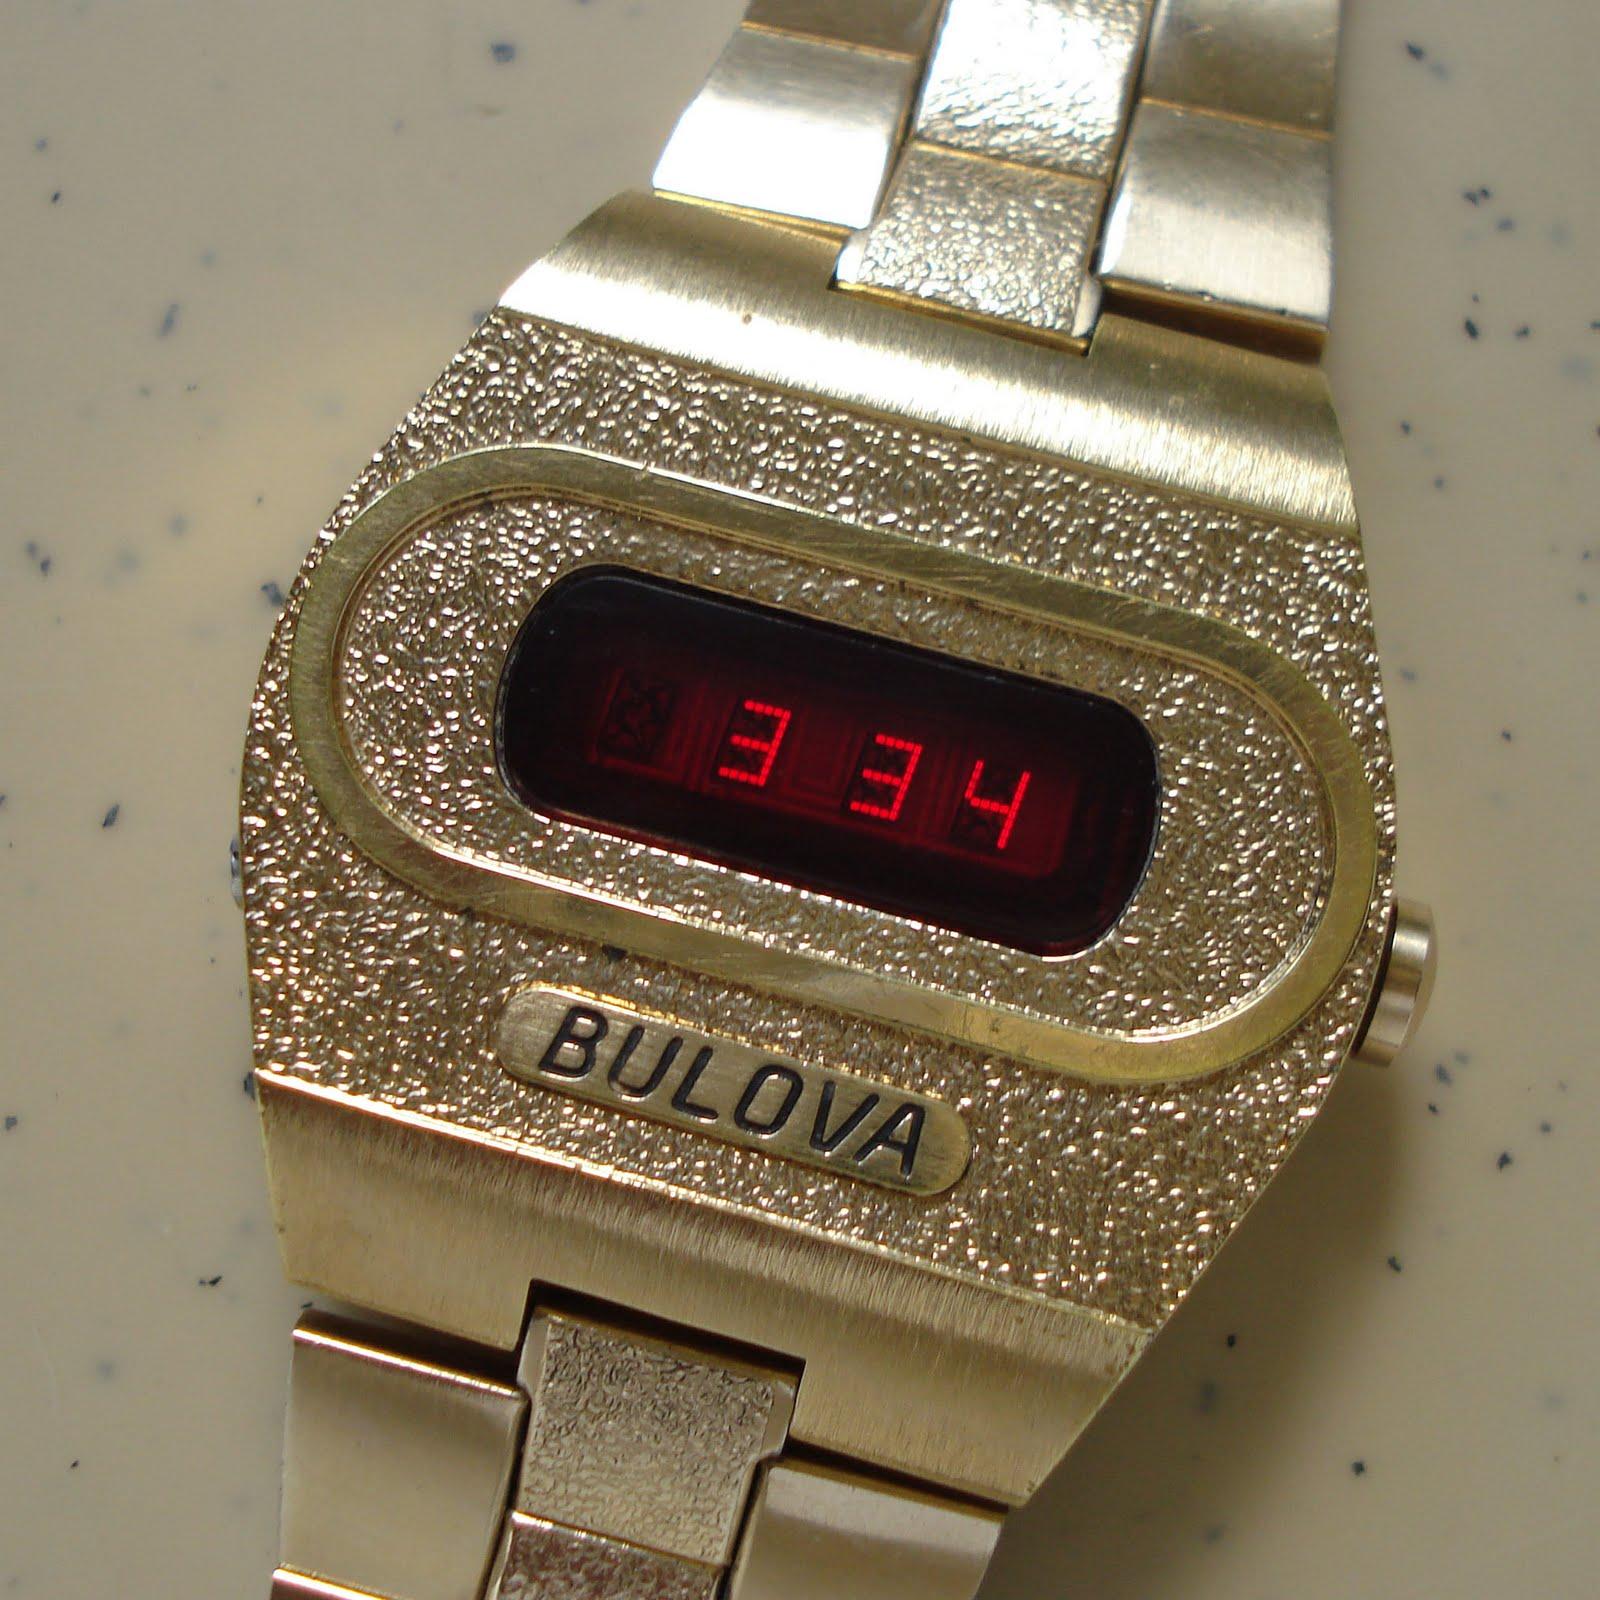 bulova vintage digital watches